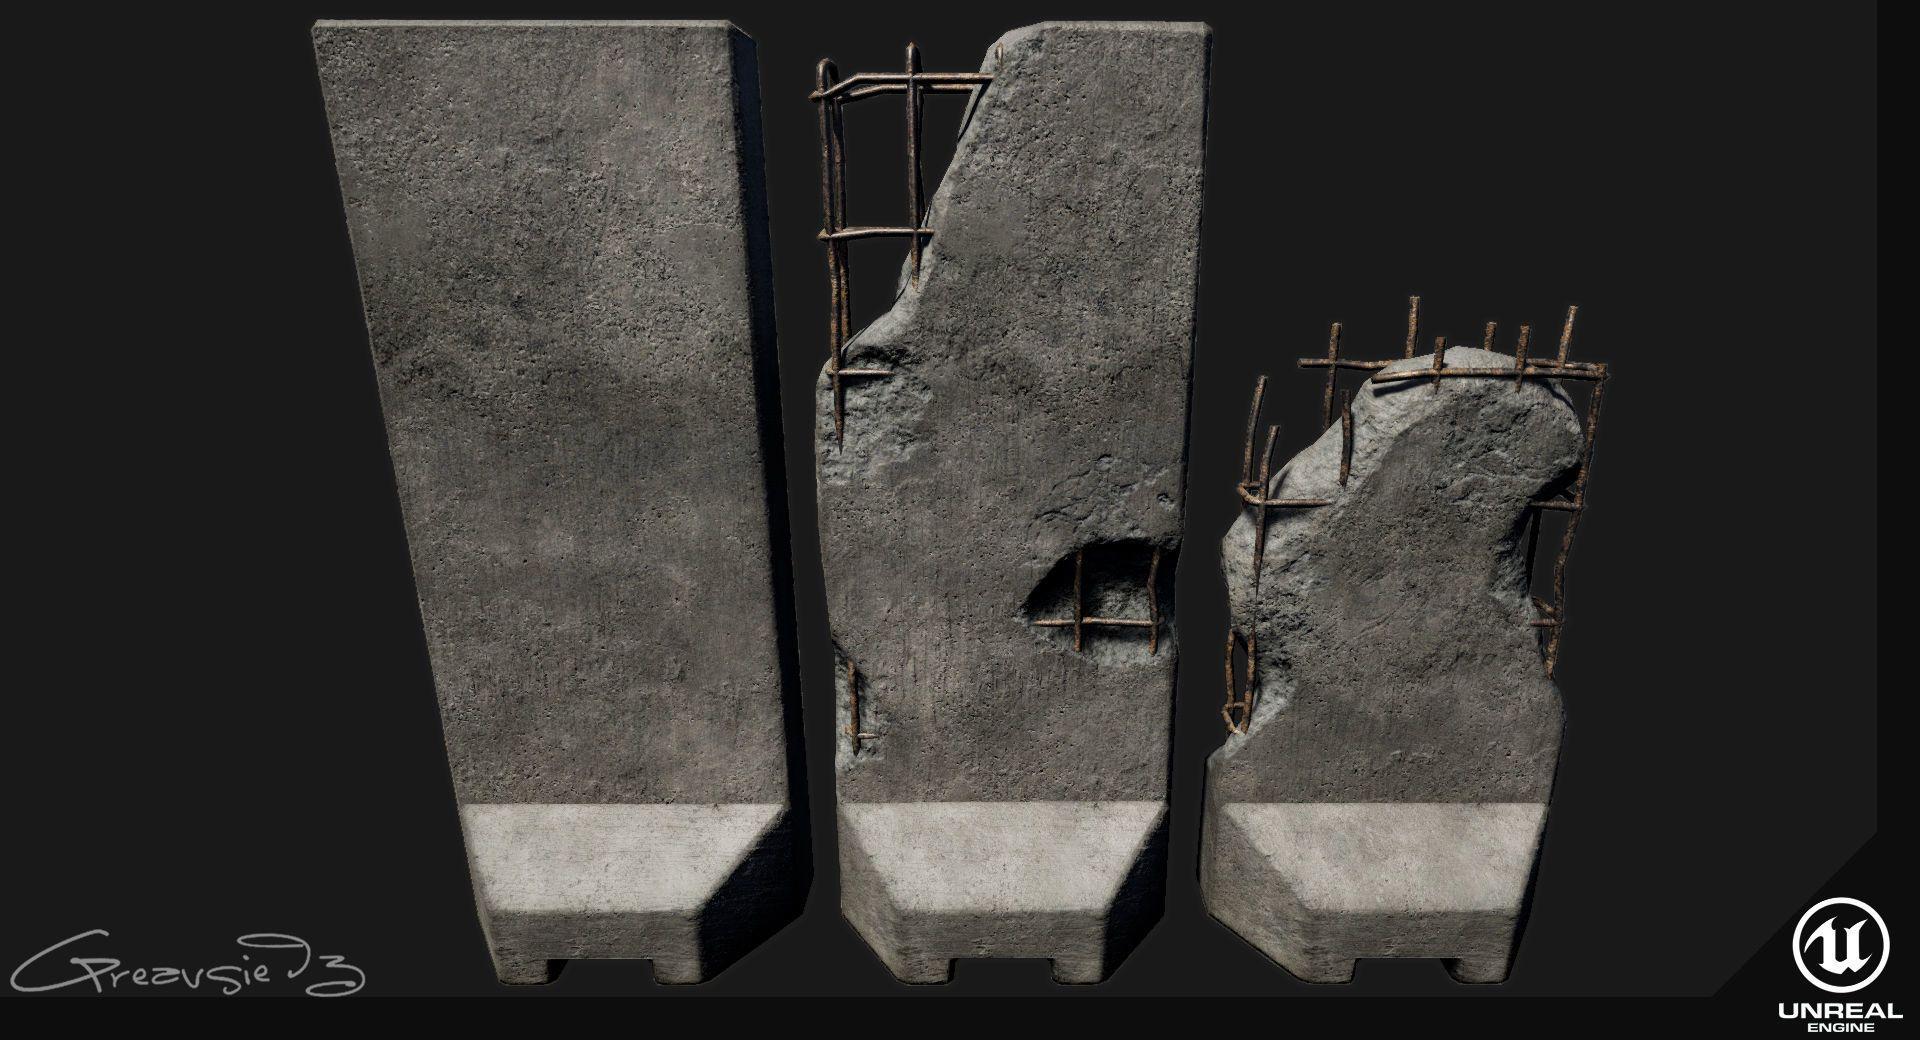 Low Poly Pbr Concrete Blast Wall 3d Model Low Poly Max Obj Fbx Uasset Jpg 1920 1040